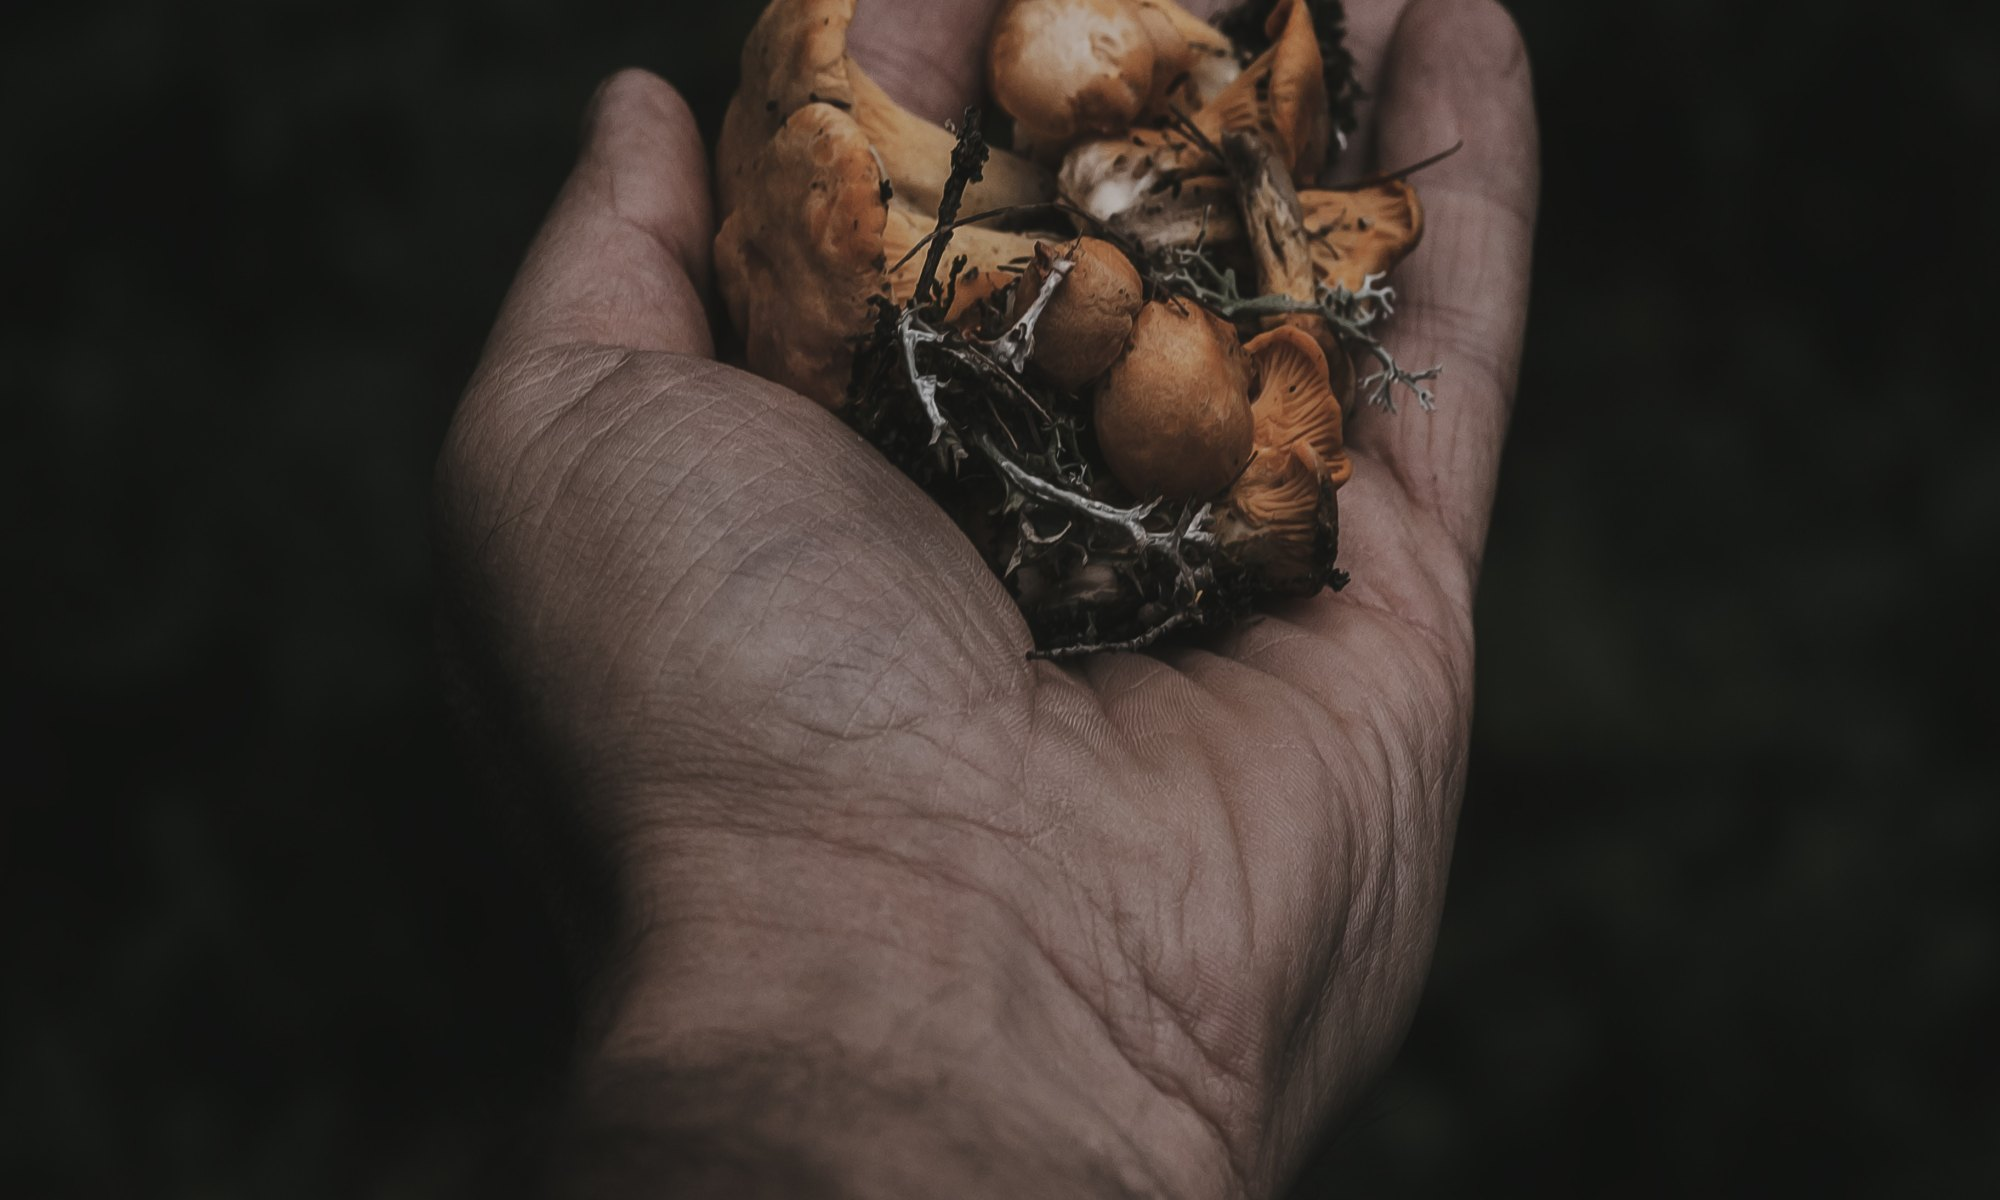 A man's hand holding magic mushrooms